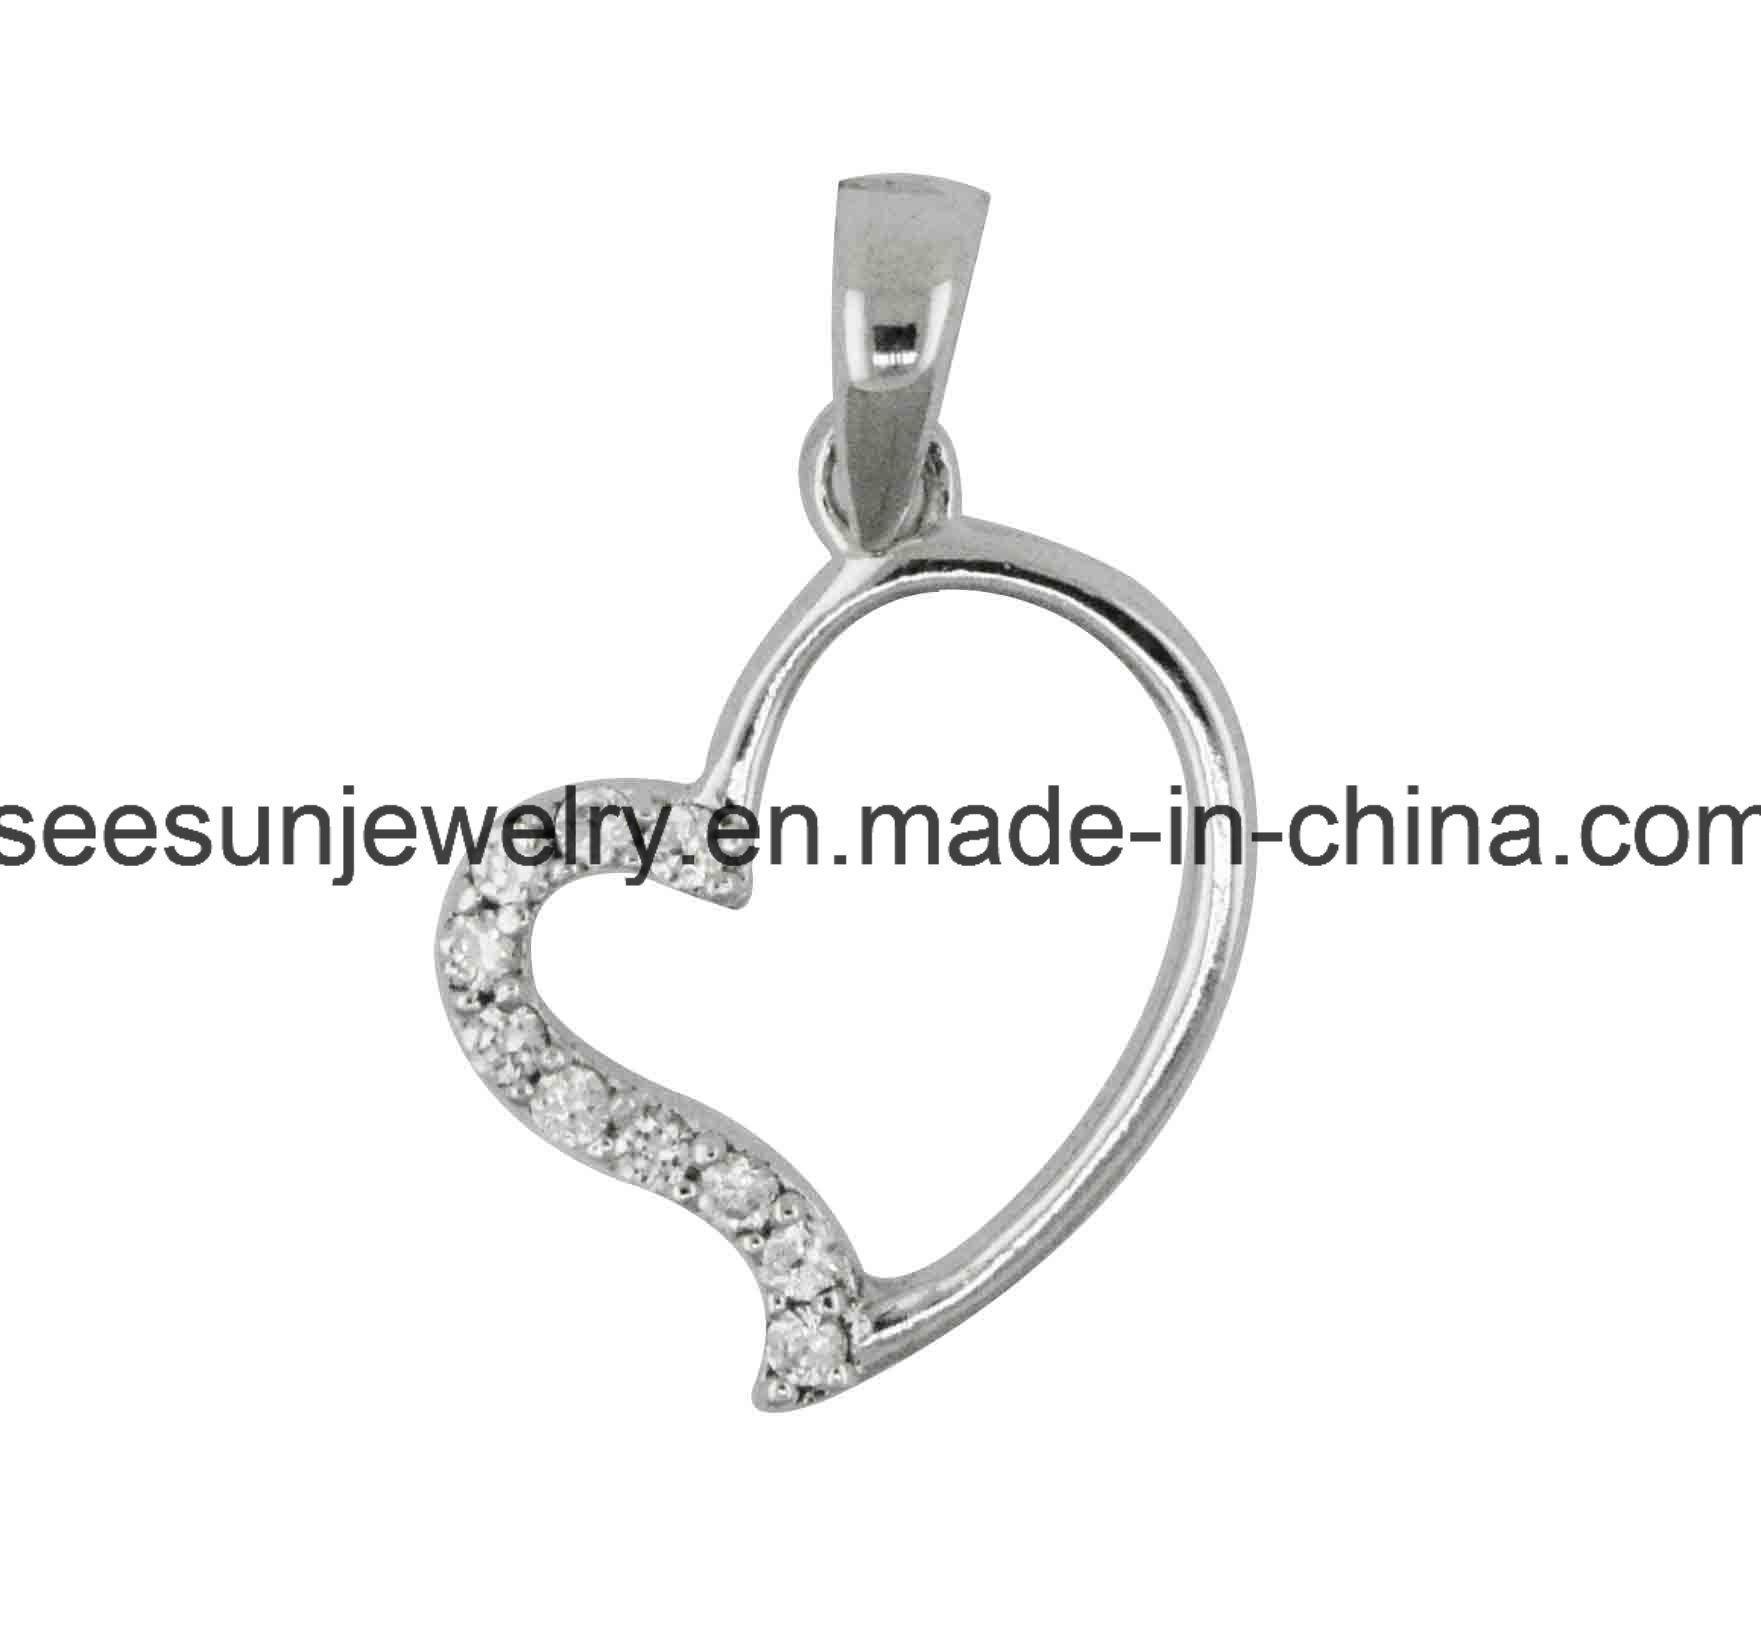 2016 Hotsale 925 Silver Heart Pendant for Love